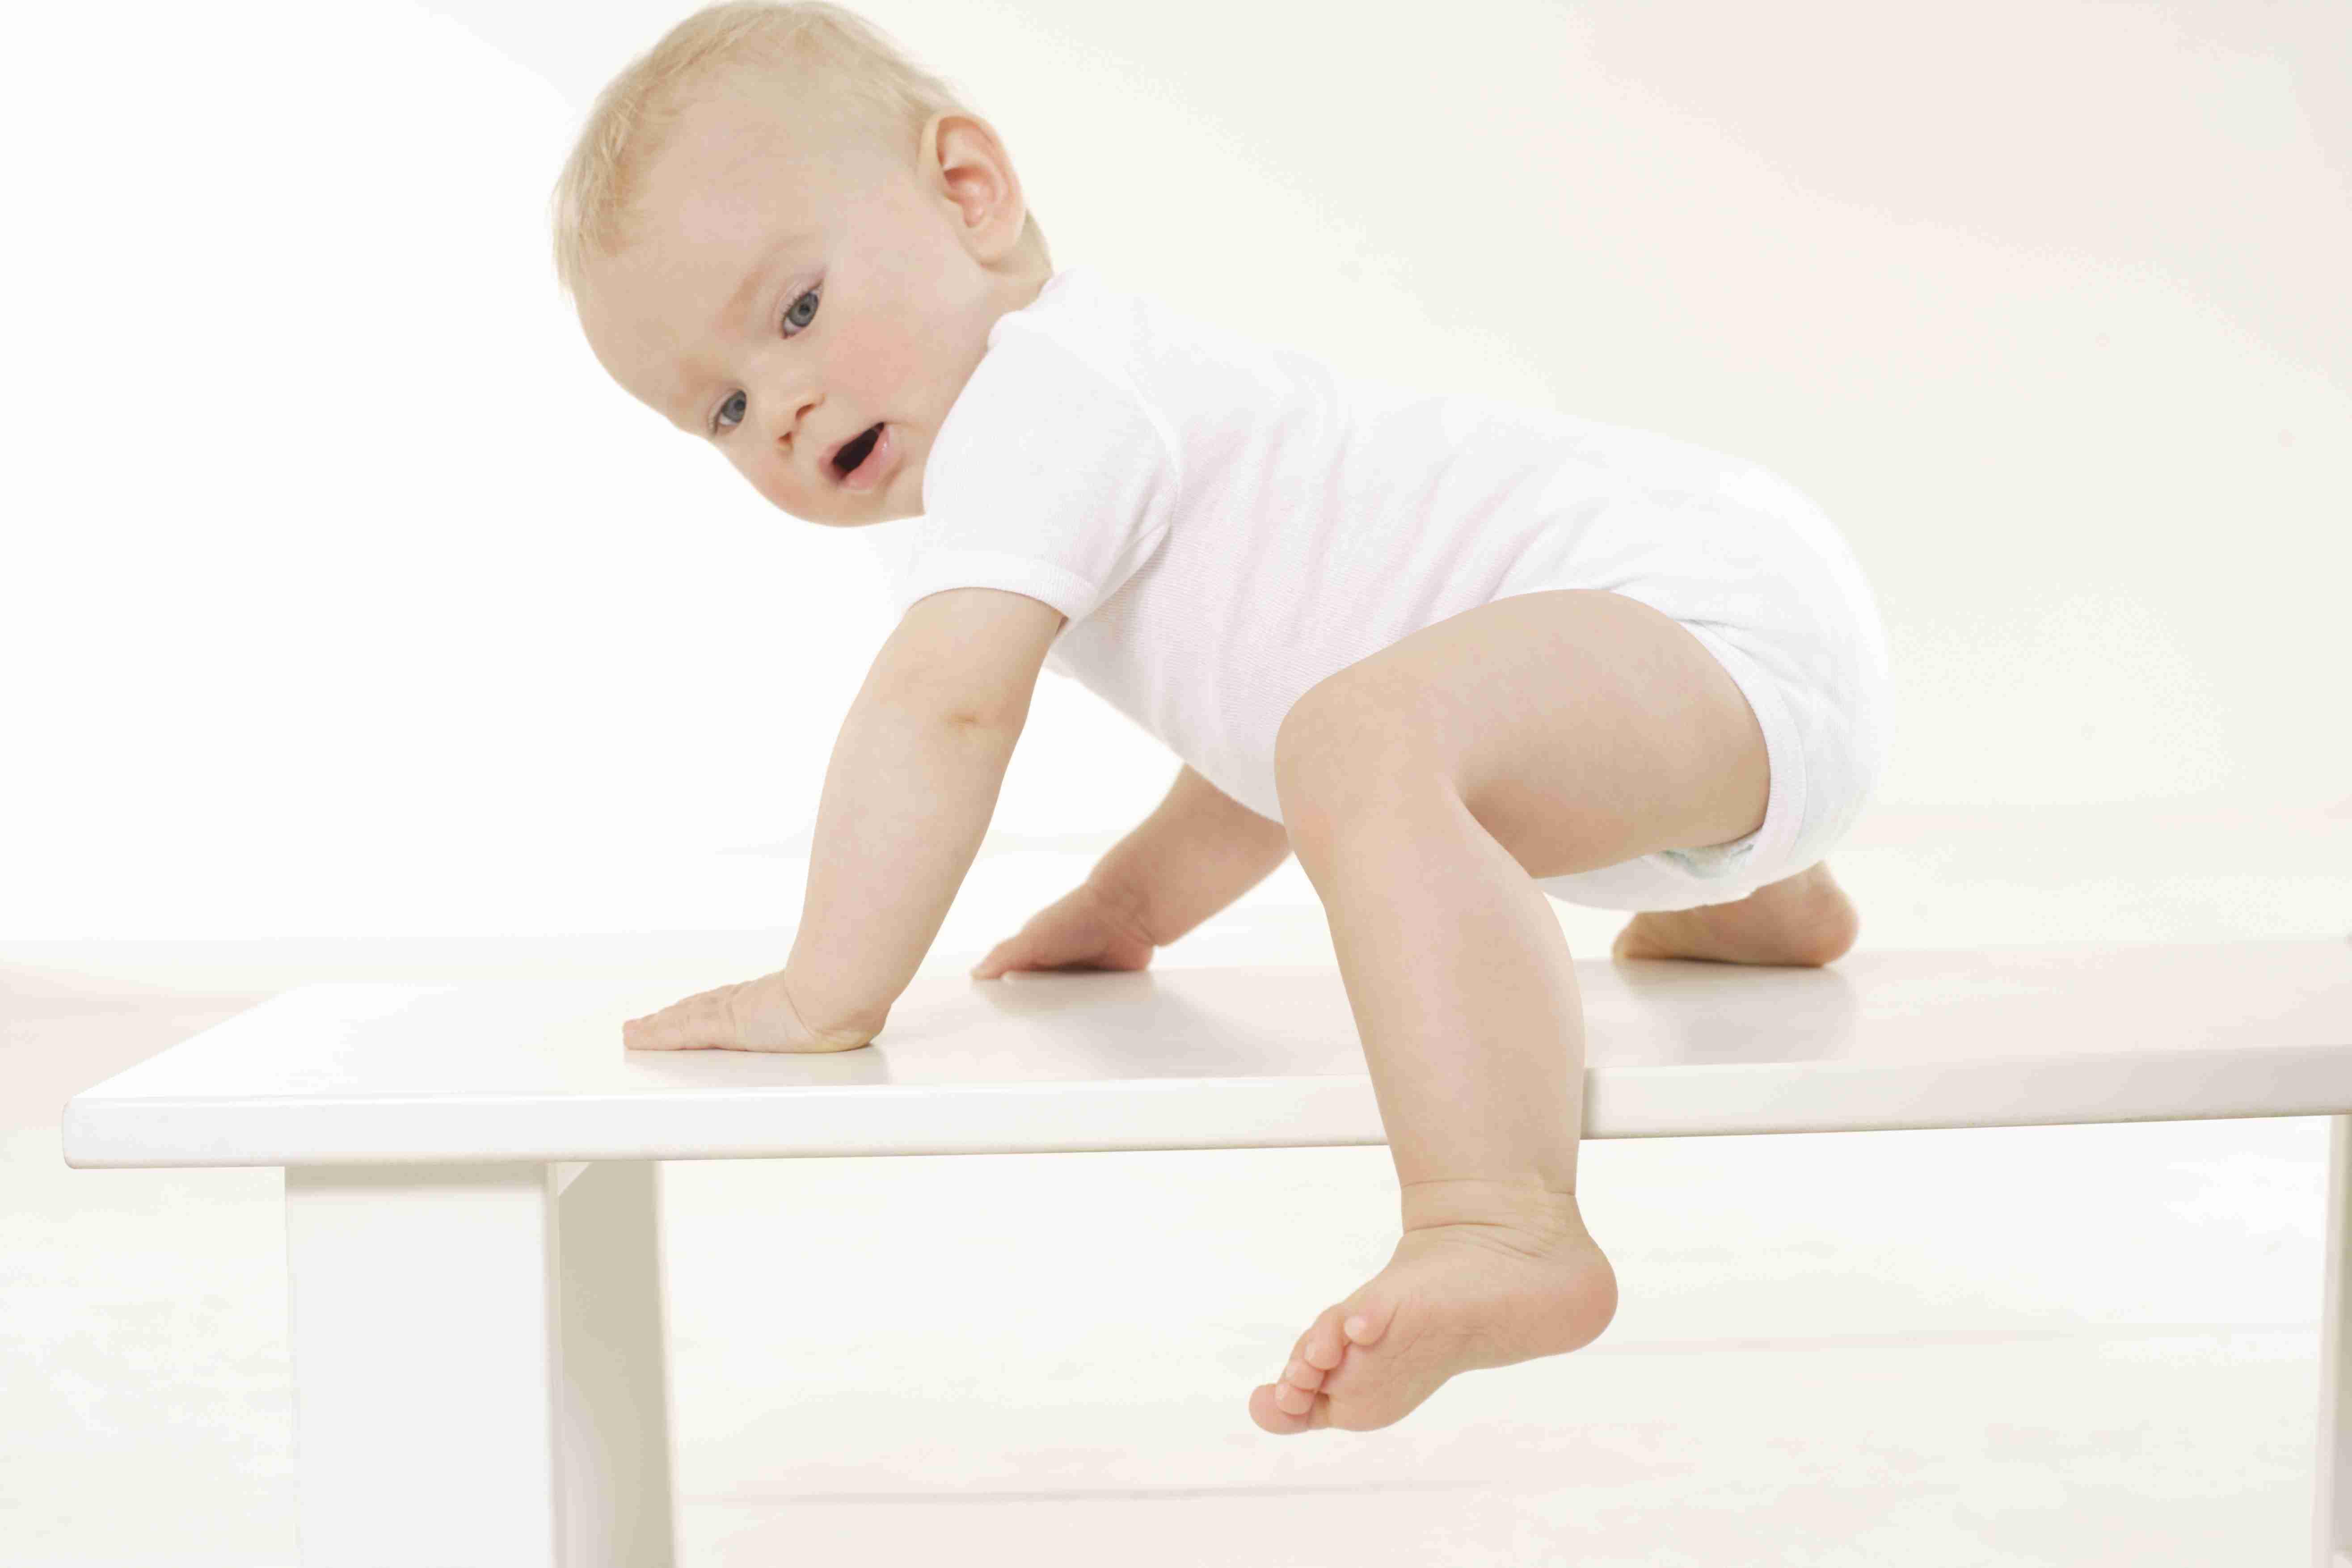 Baby climbing on furniture.